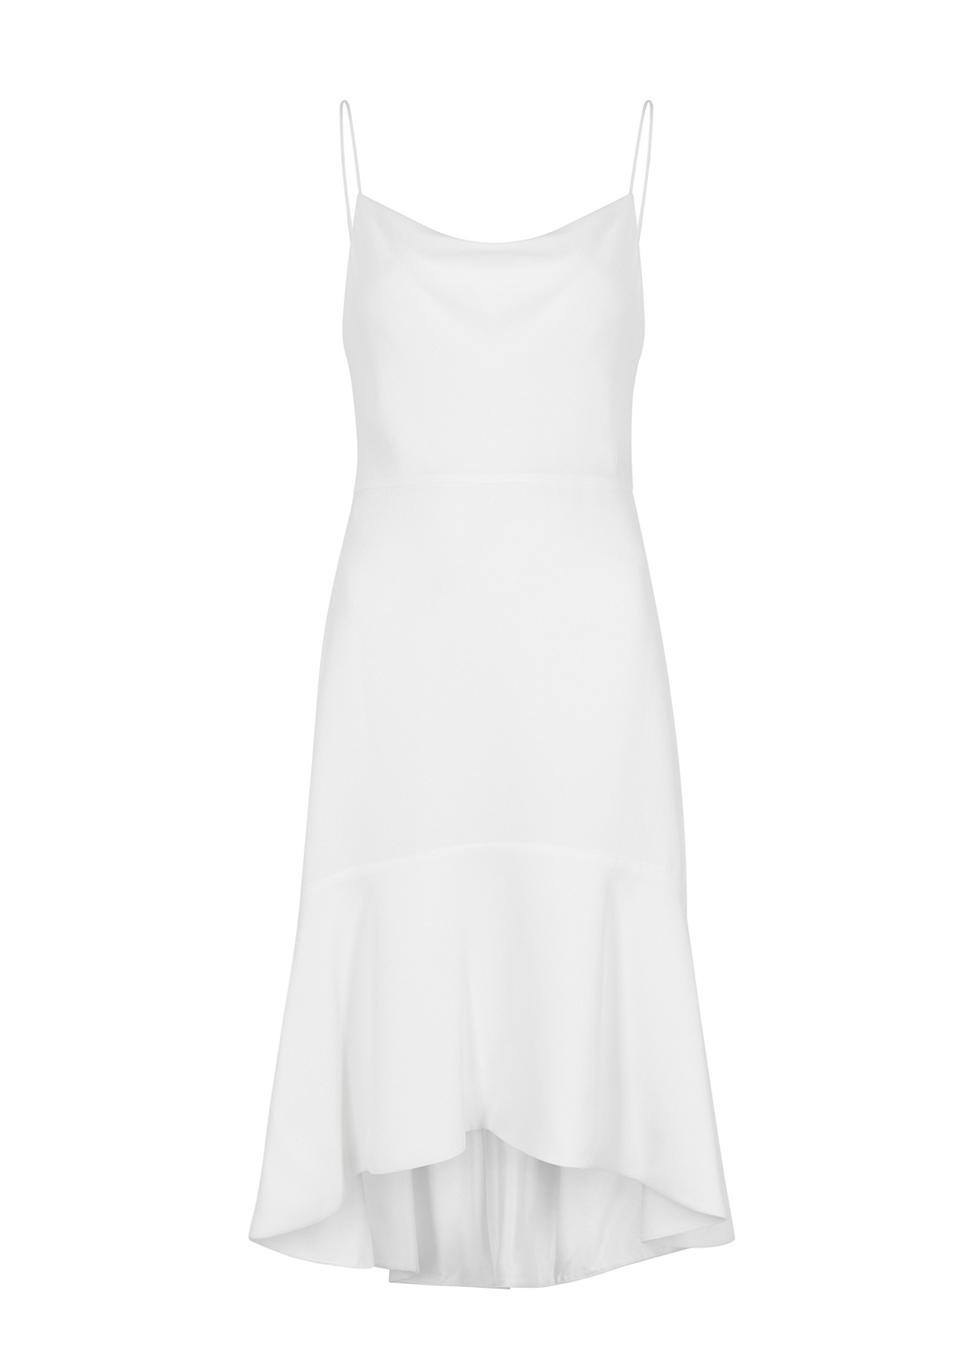 0884518c3de Designer Dresses   Designer Gowns - Harvey Nichols